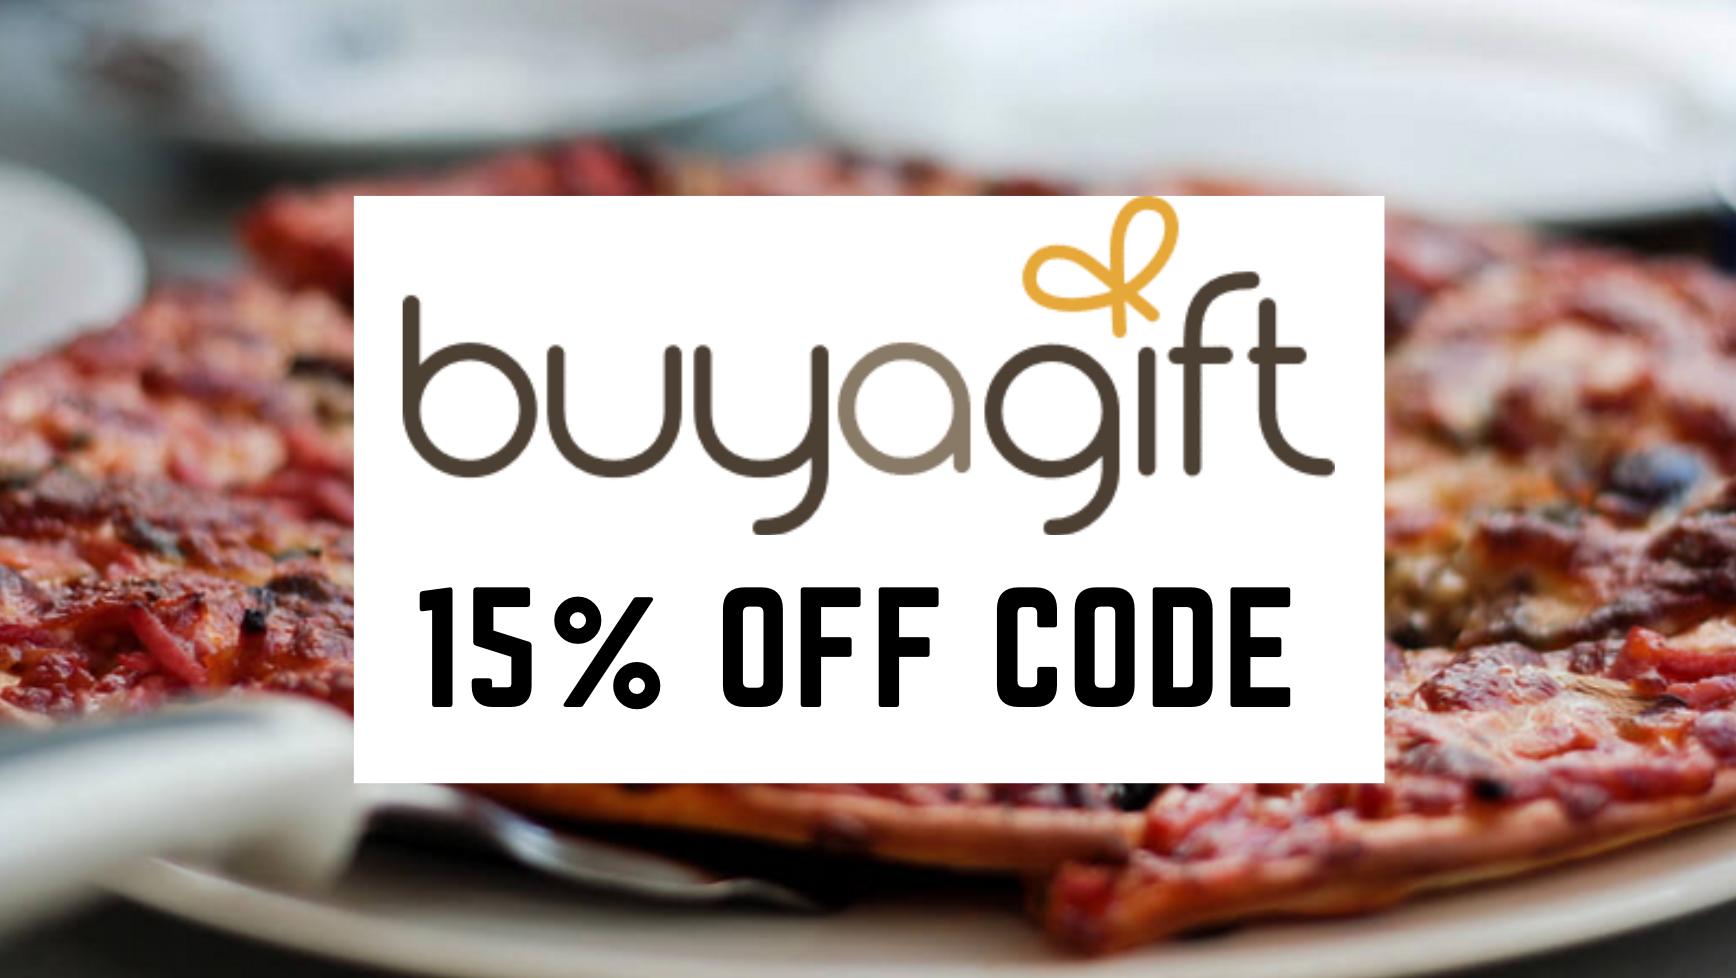 Buyagift Discount Voucher Code 15% off